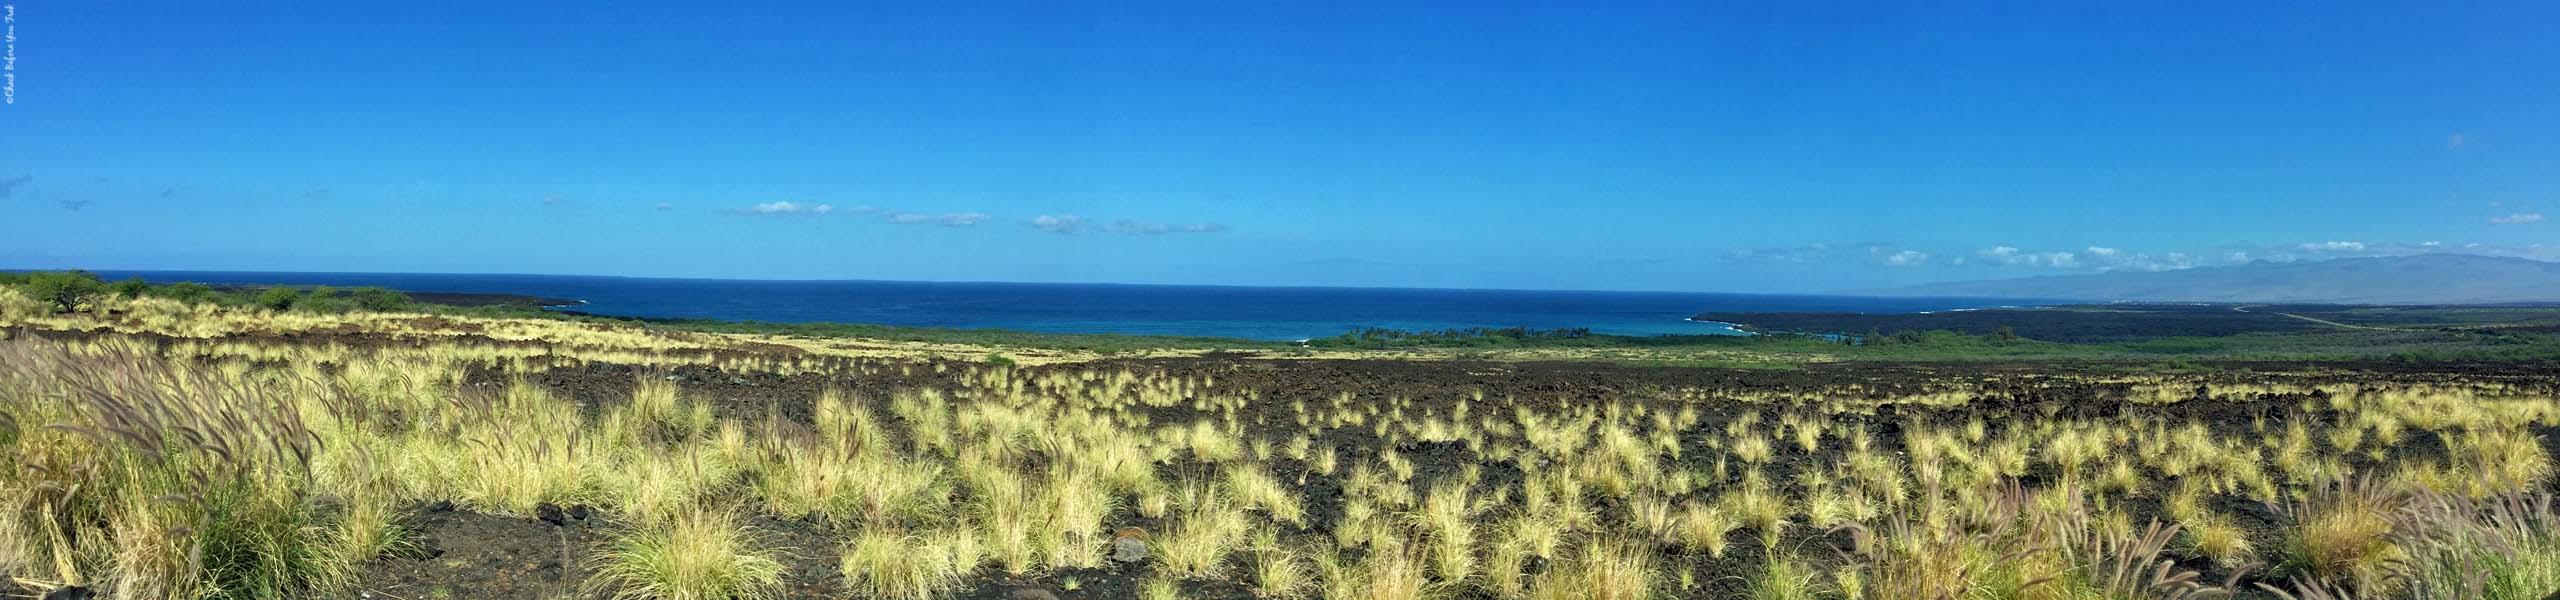 Featured Photo - Kiholo Bay Scenic Overlook - Big Island, Hawaii, USA